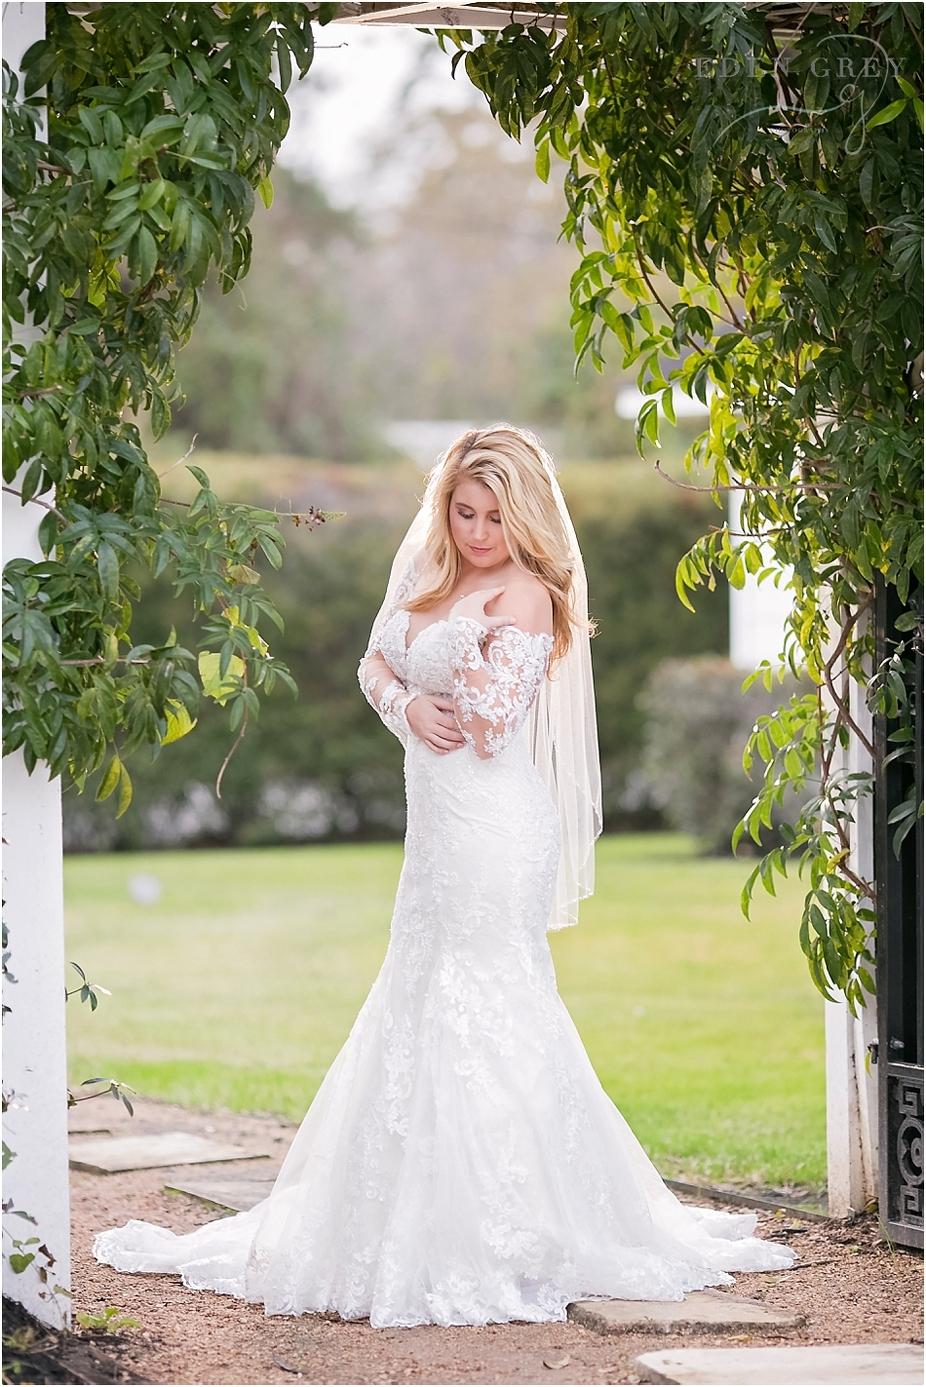 Ashlynn Manor Bridal Pictures